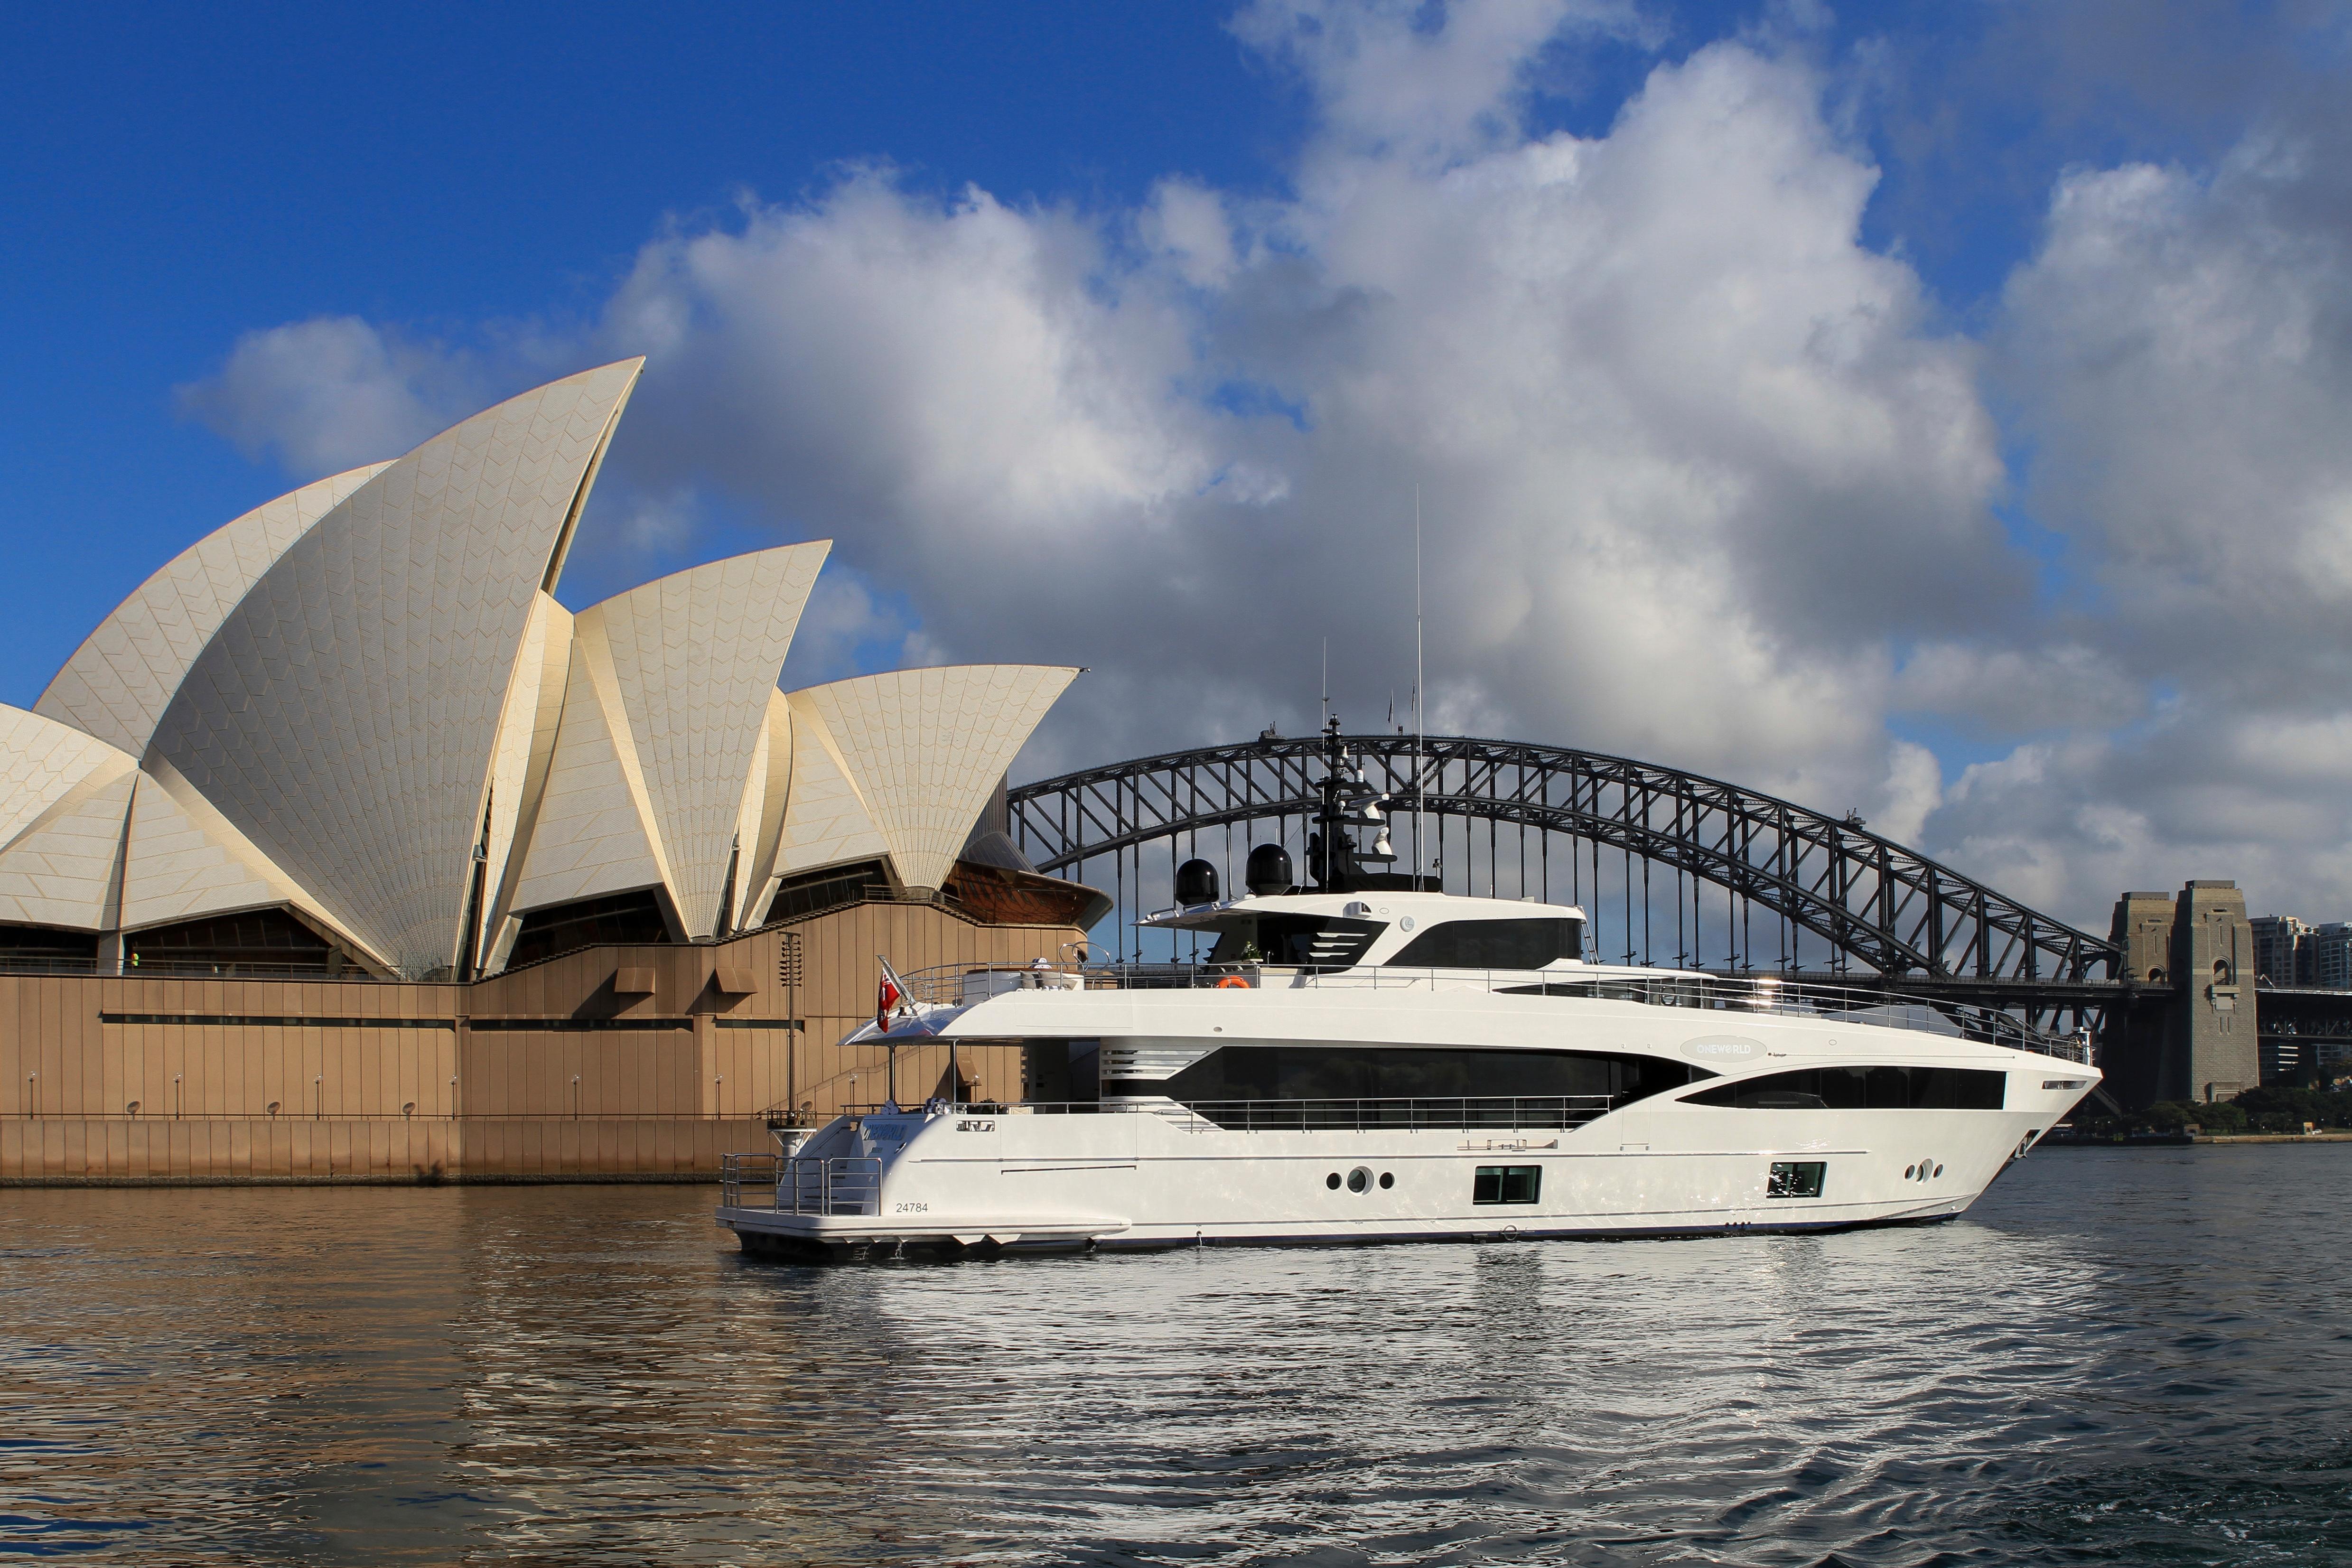 Majesty 100-3 MY Oneworld Sydney Harbour 7 April 2018 Richard Morris Australian Superyachts (156).jpg